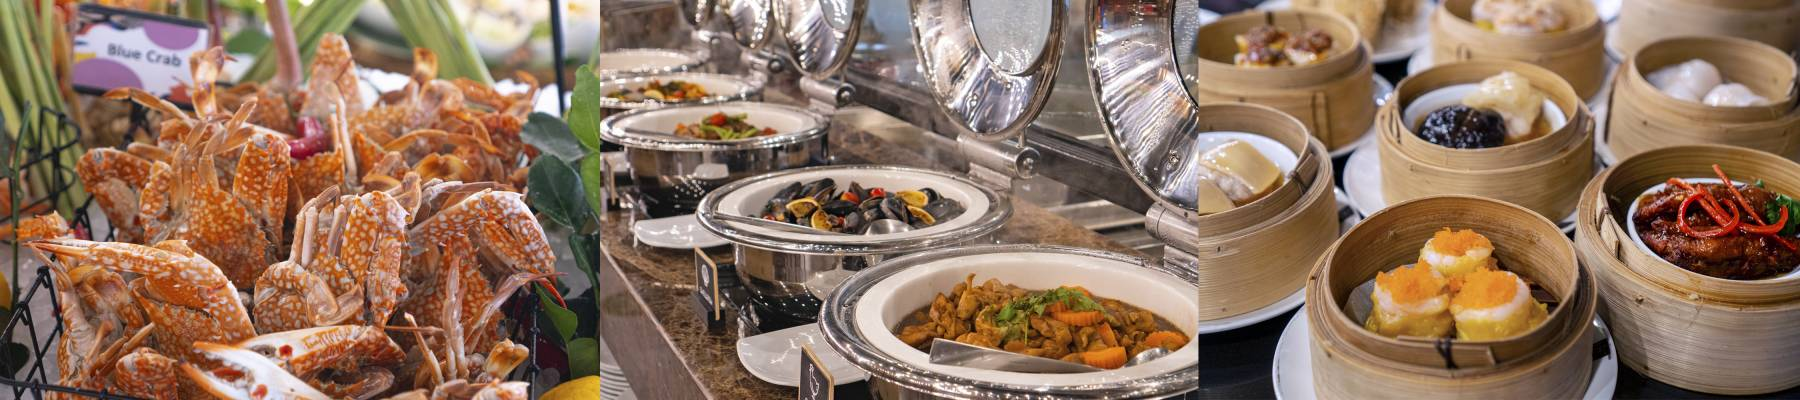 Bangkok Lunch Buffet Promotion